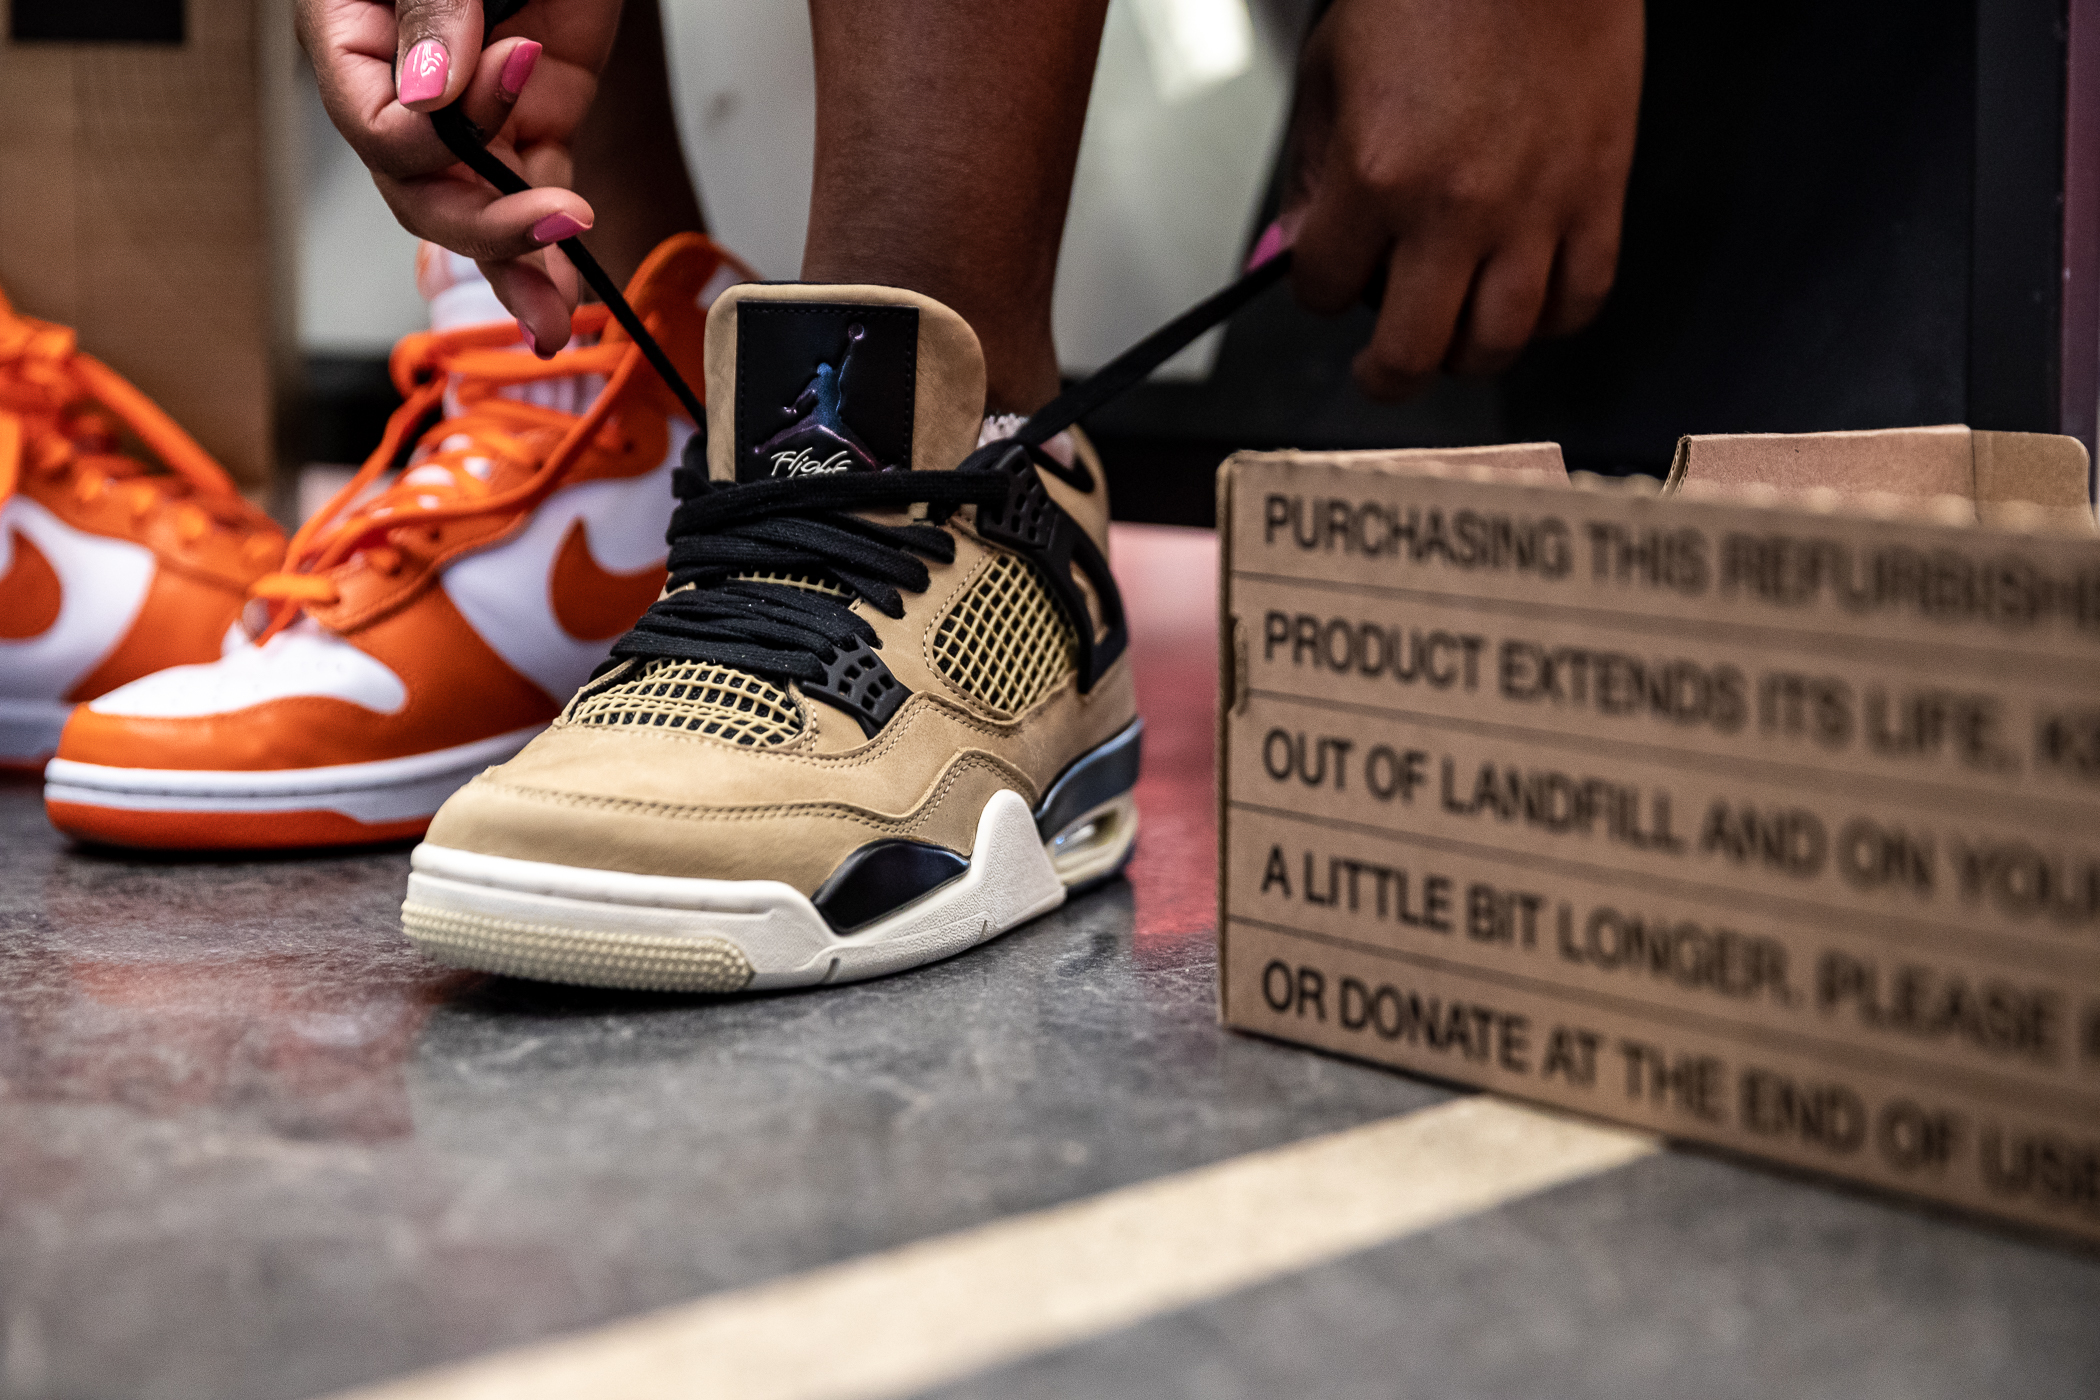 Nike Starts A Refurbished Program For Used Kicks